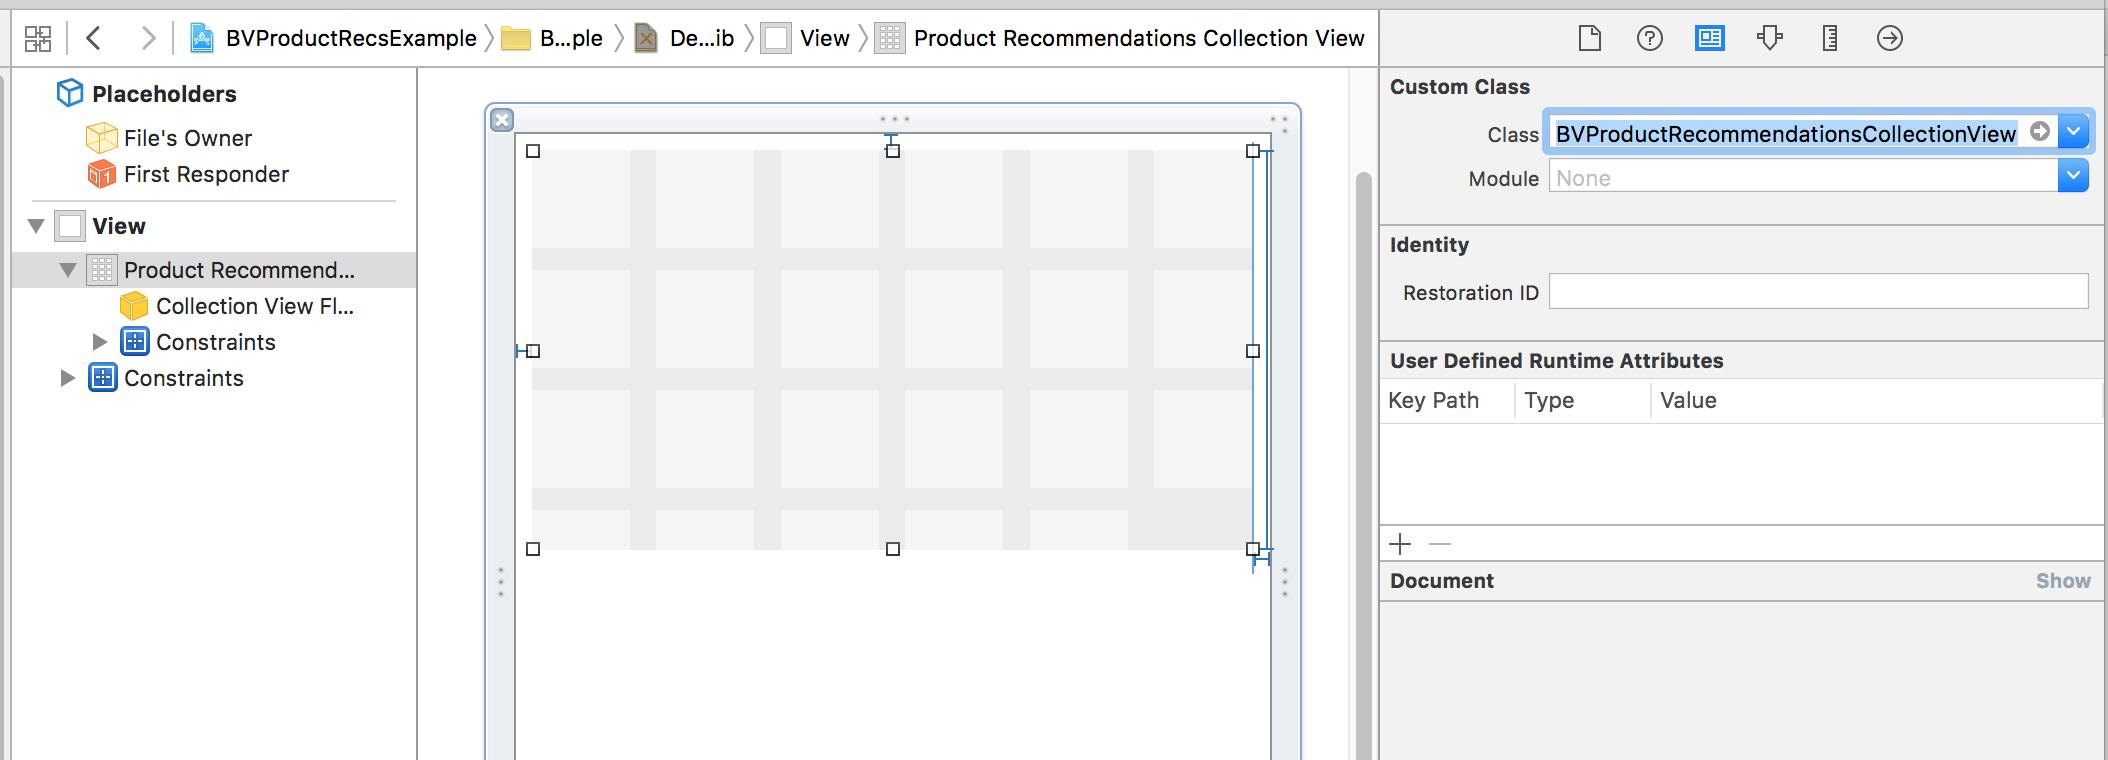 Bazaarvoice Developer Portal | Product Recommendations